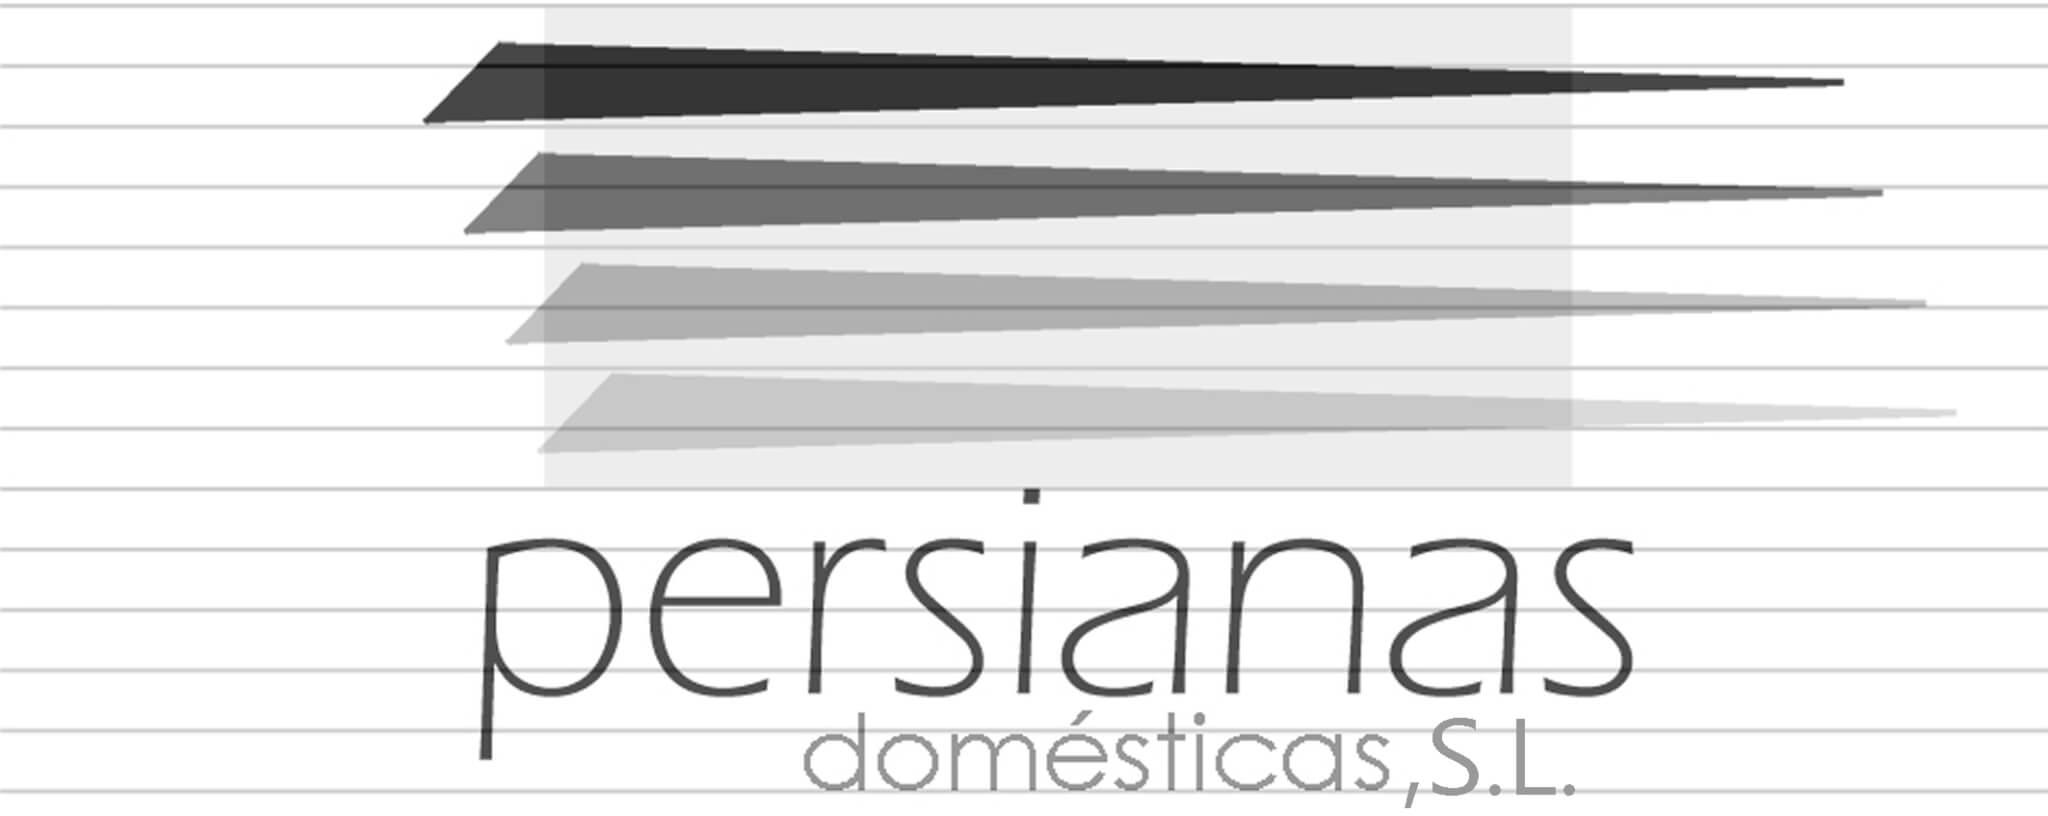 Persianas domésticas